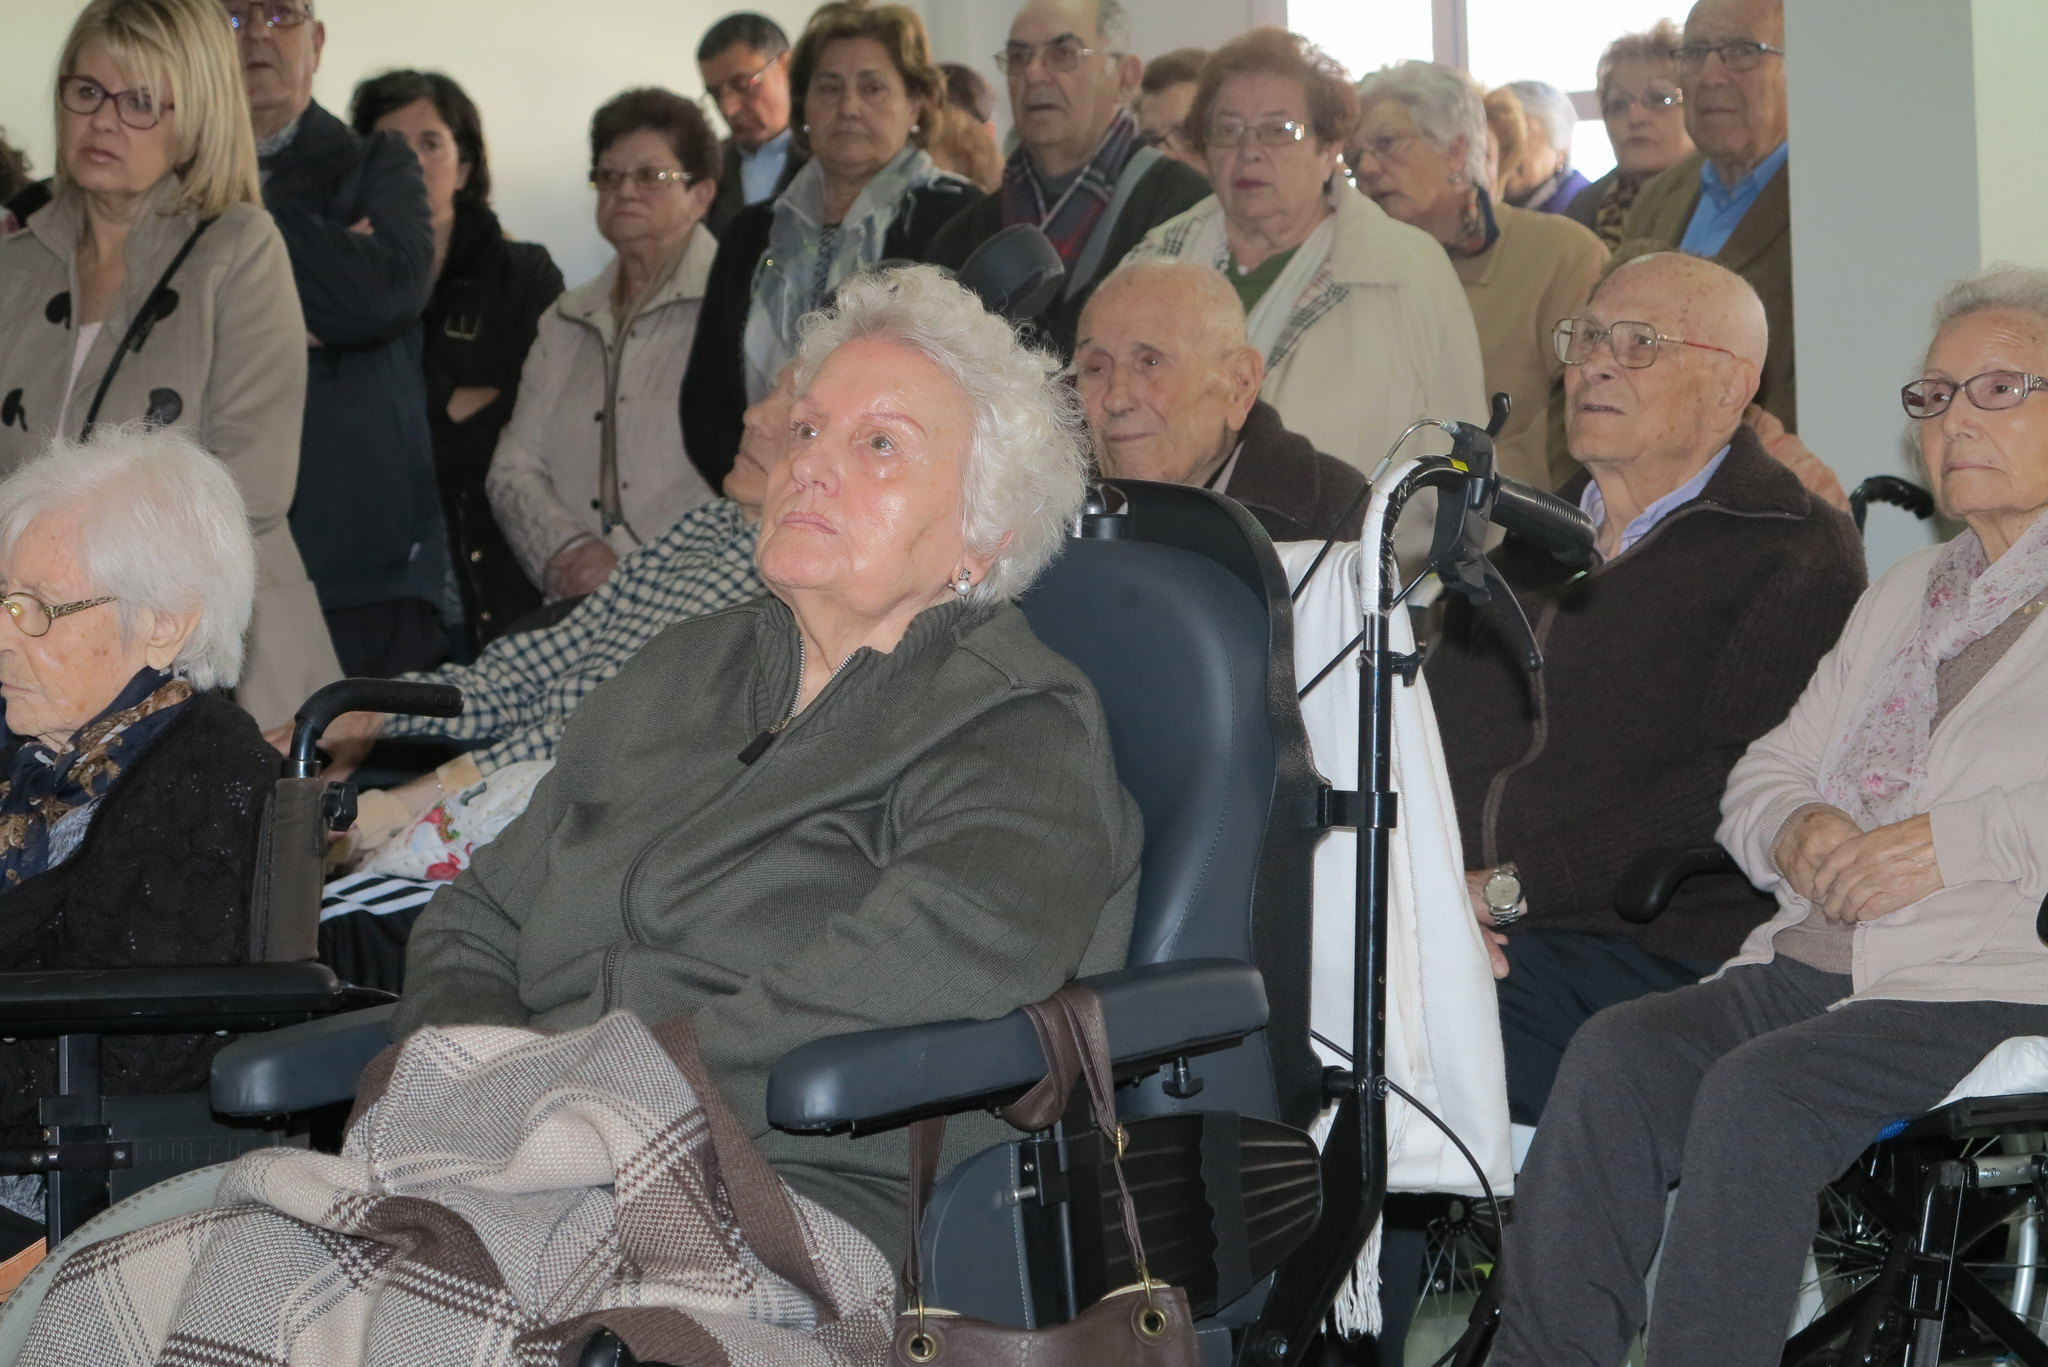 (2016-02-13) - Inauguración Virgen de Lourdes, La Molineta - Archivo La Molineta 2 (32)